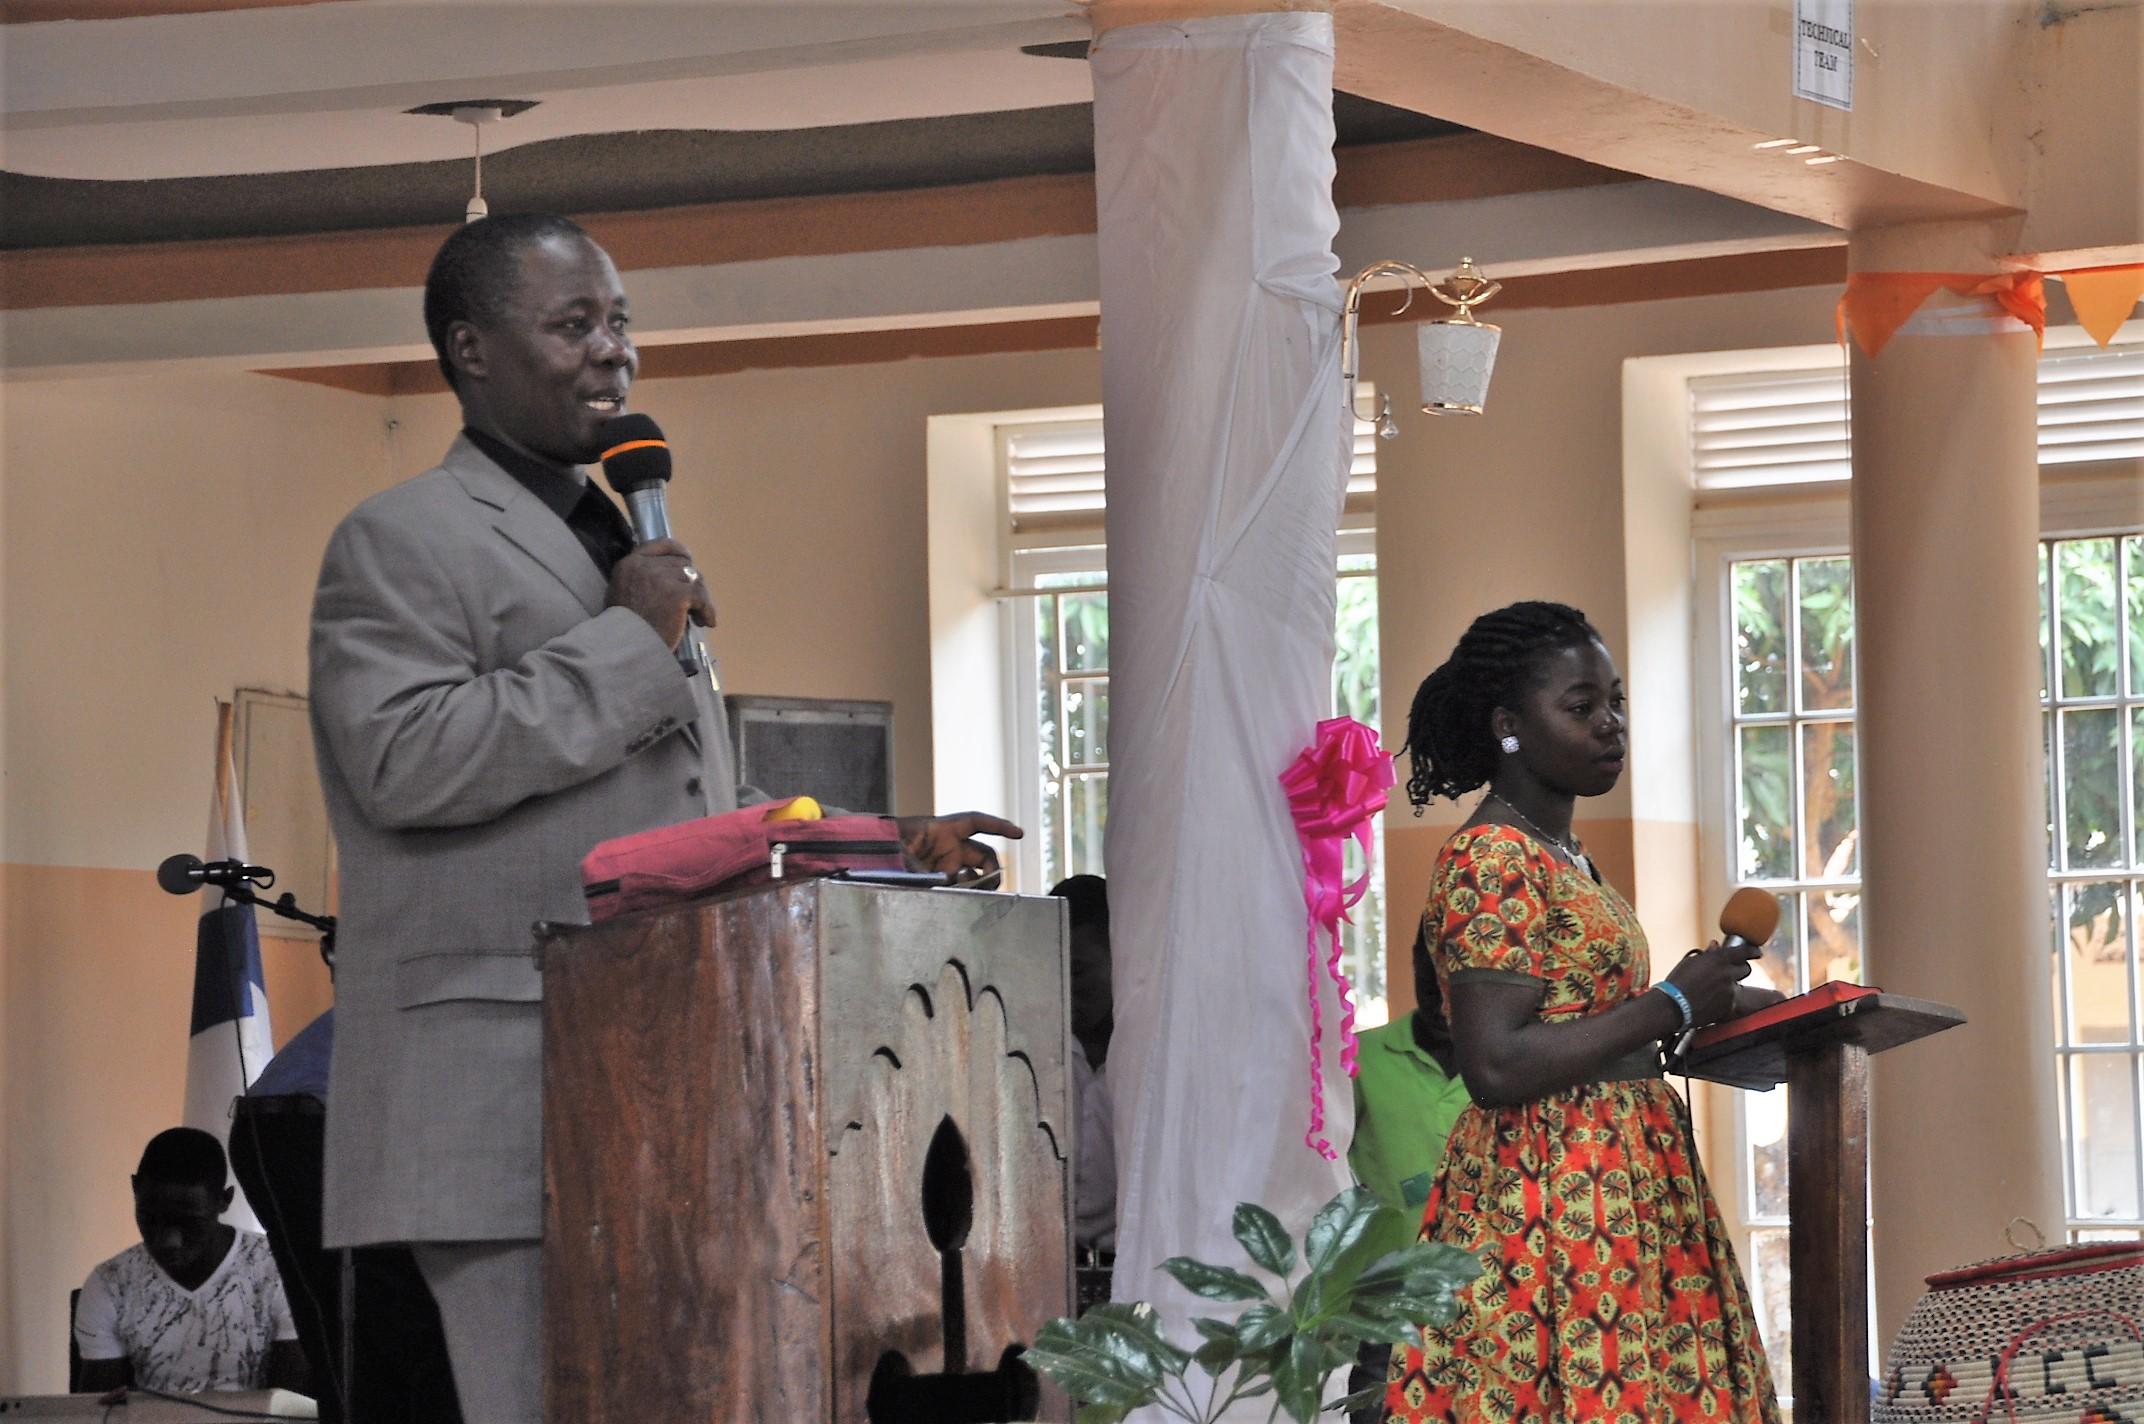 Gabriel leading worship with Bush